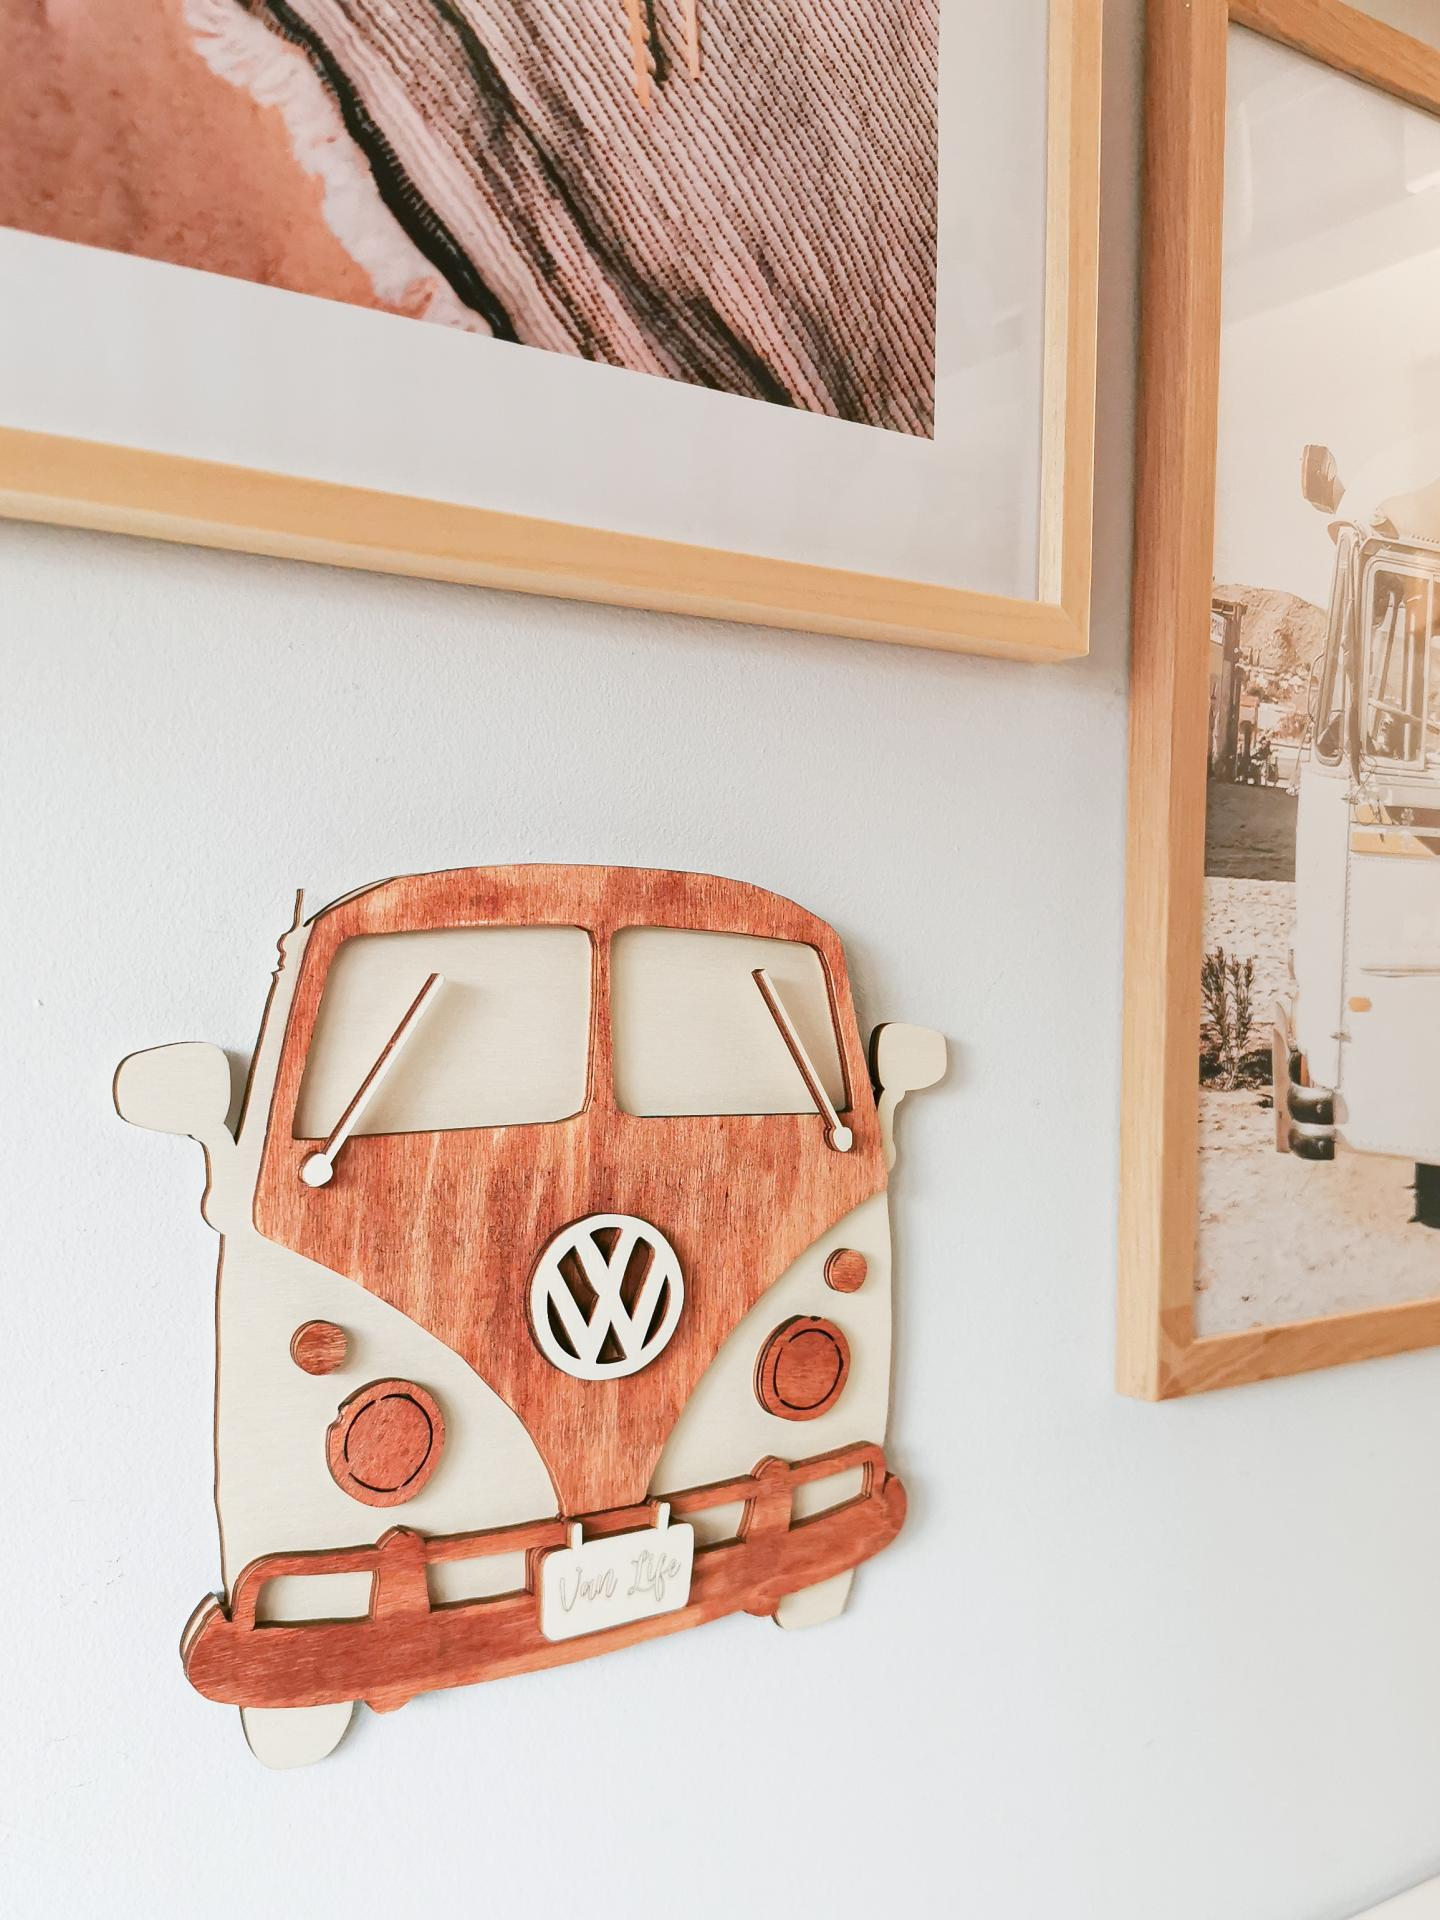 Van life wood